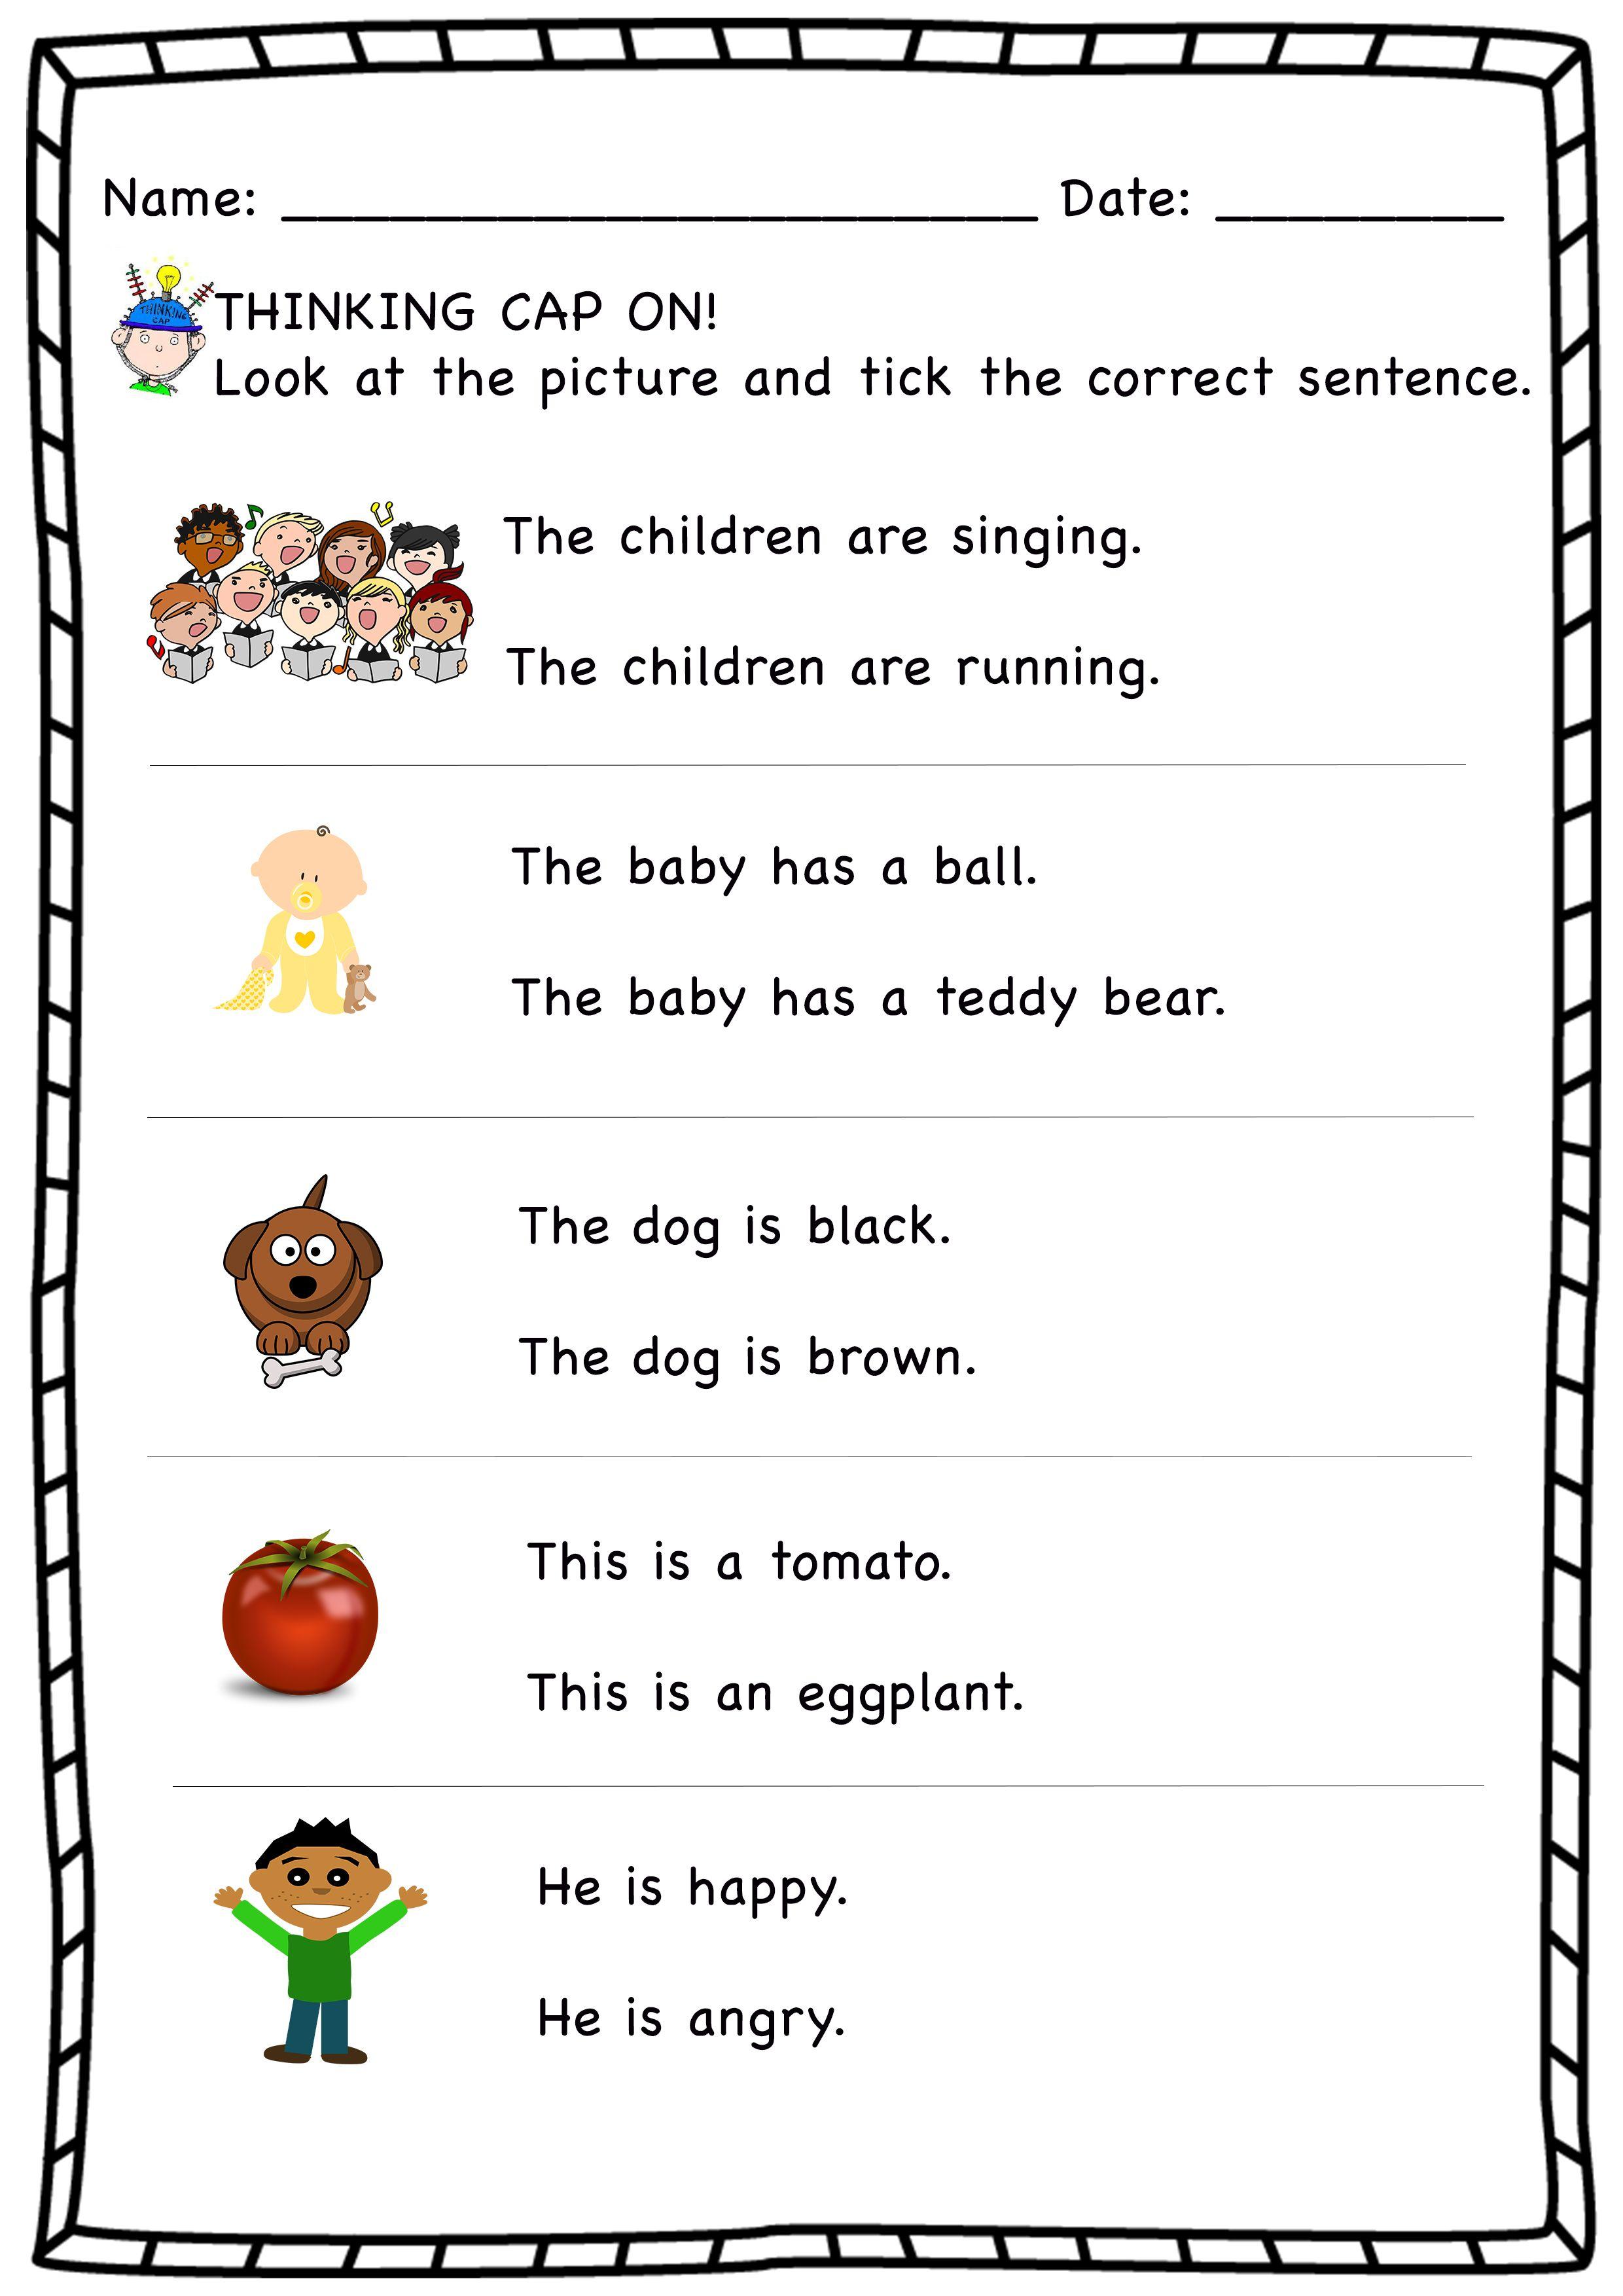 Sentence Correction Worksheets 1st Grade